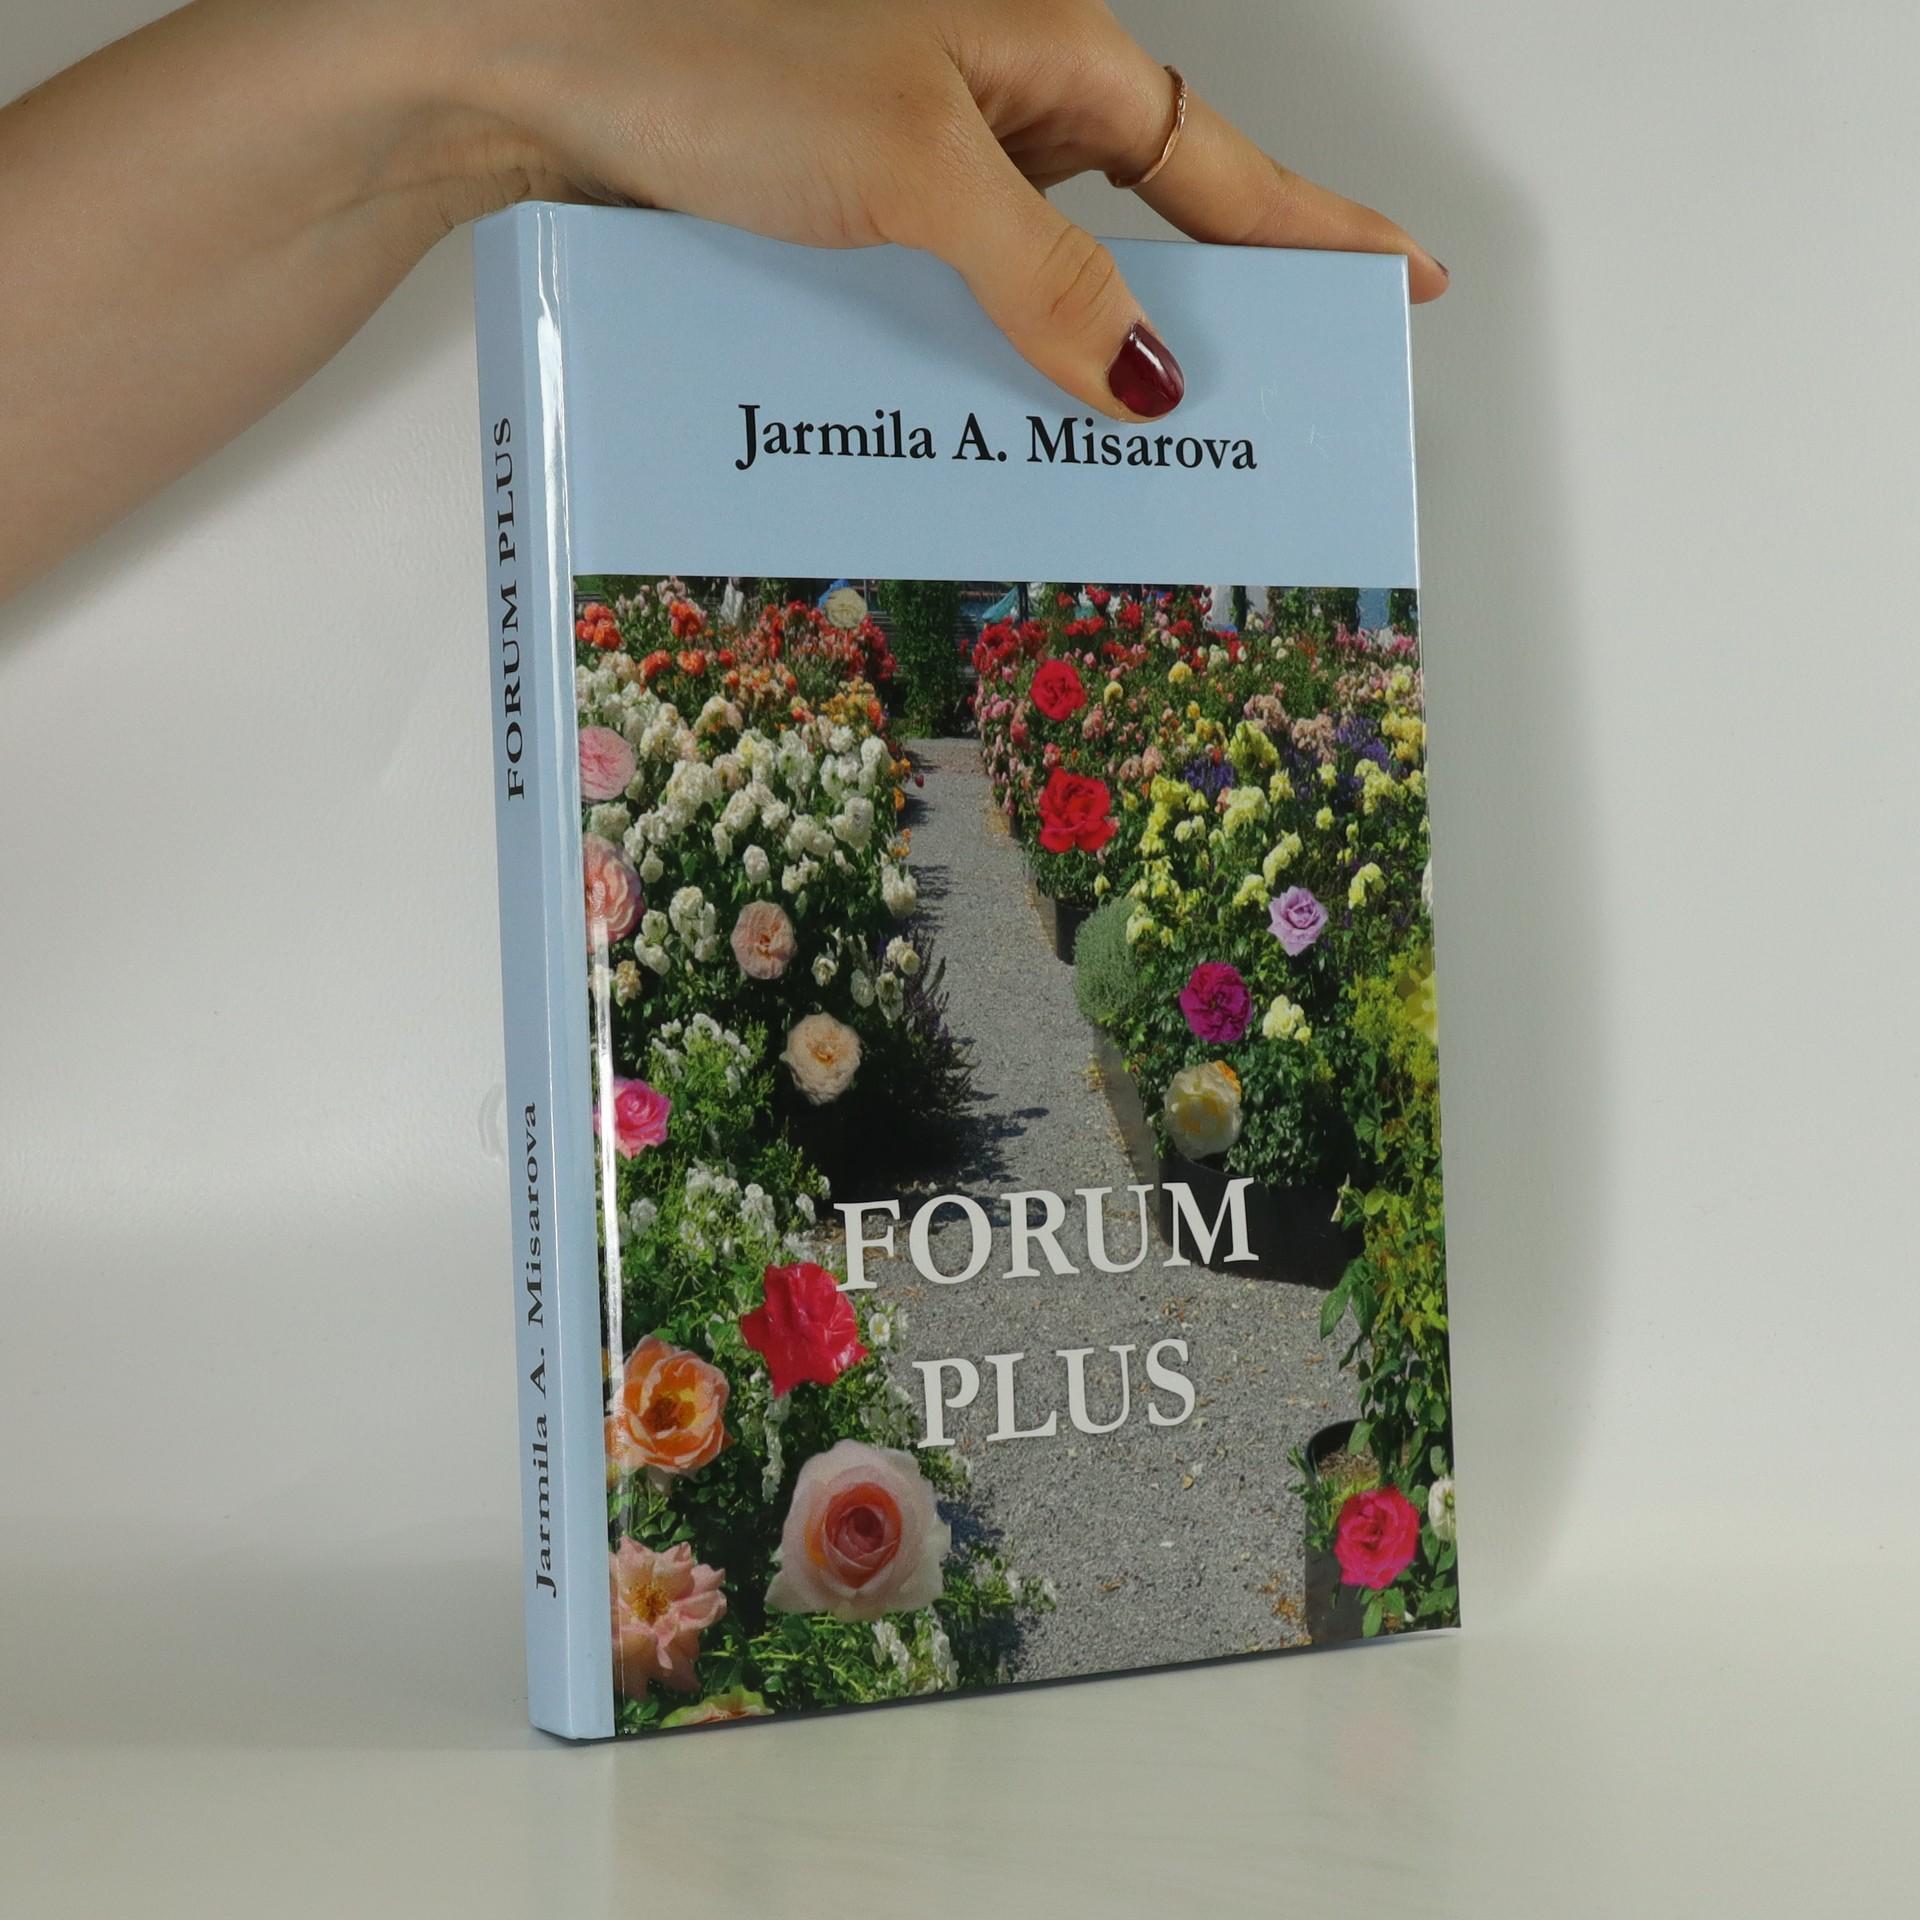 antikvární kniha Forum plus, 2019